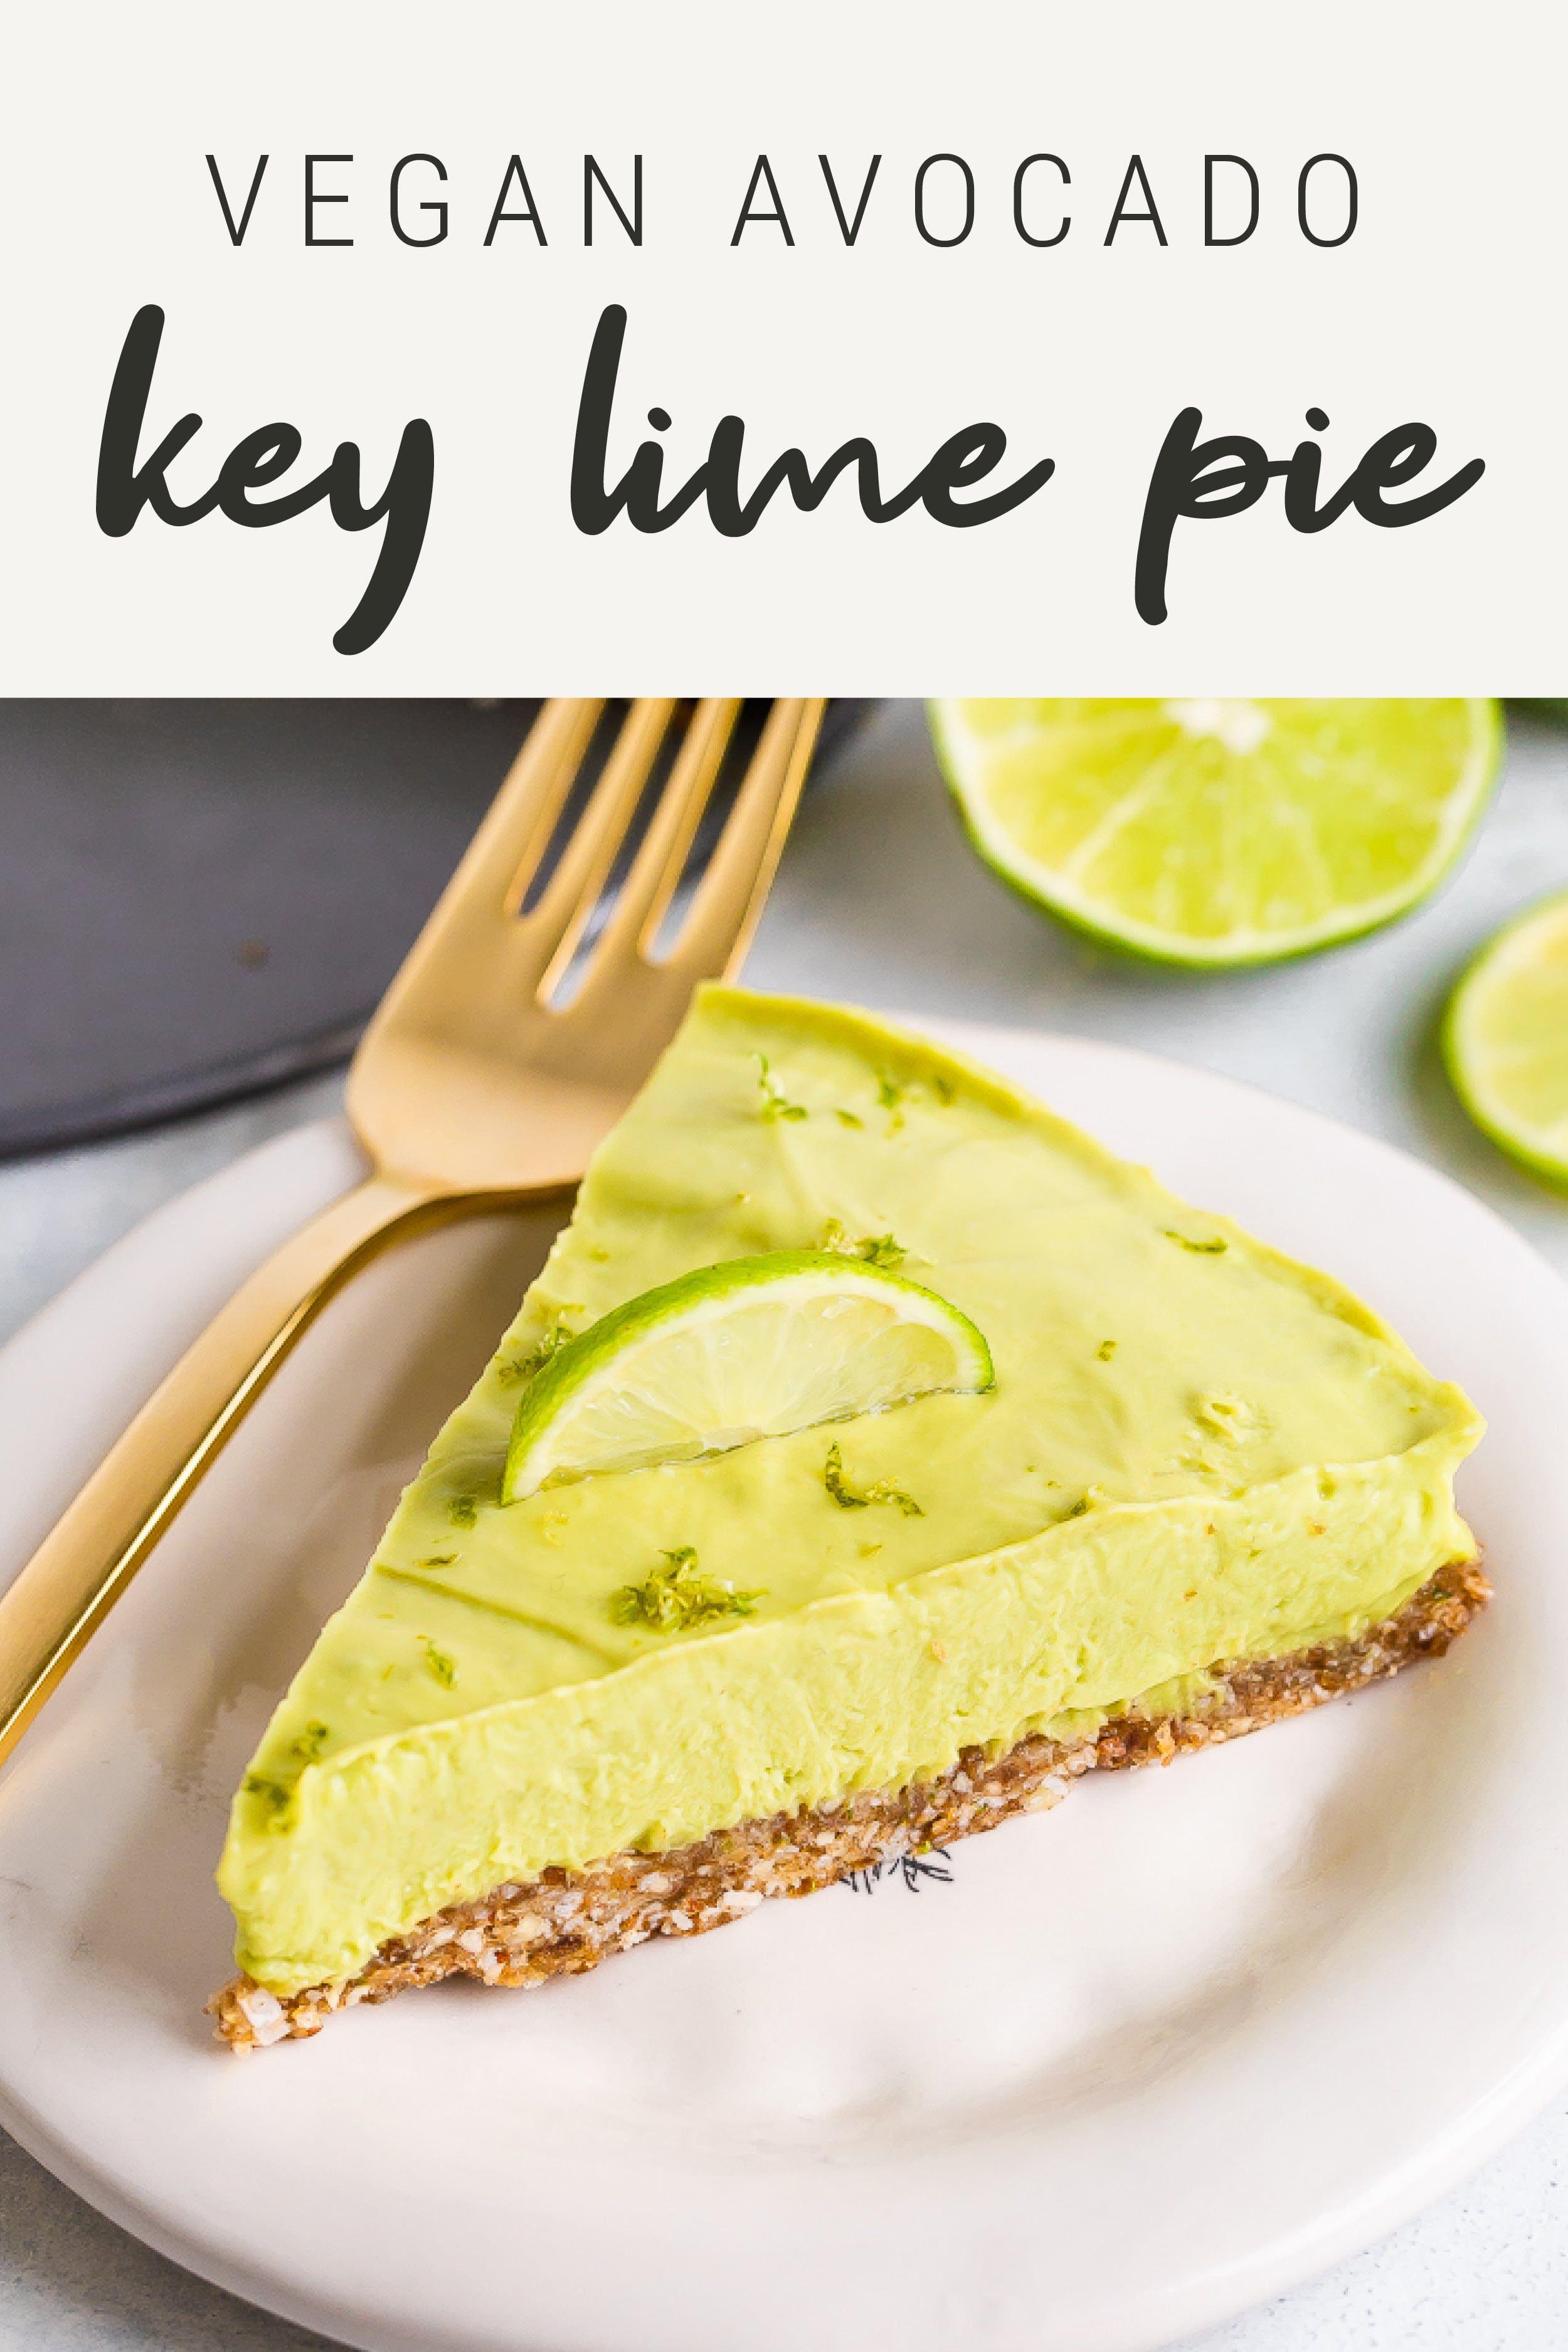 Creamy Lime And Avocado Tart Vegan Gluten Free Eating Bird Food Recipe In 2020 Healthy Pies Recipes Food